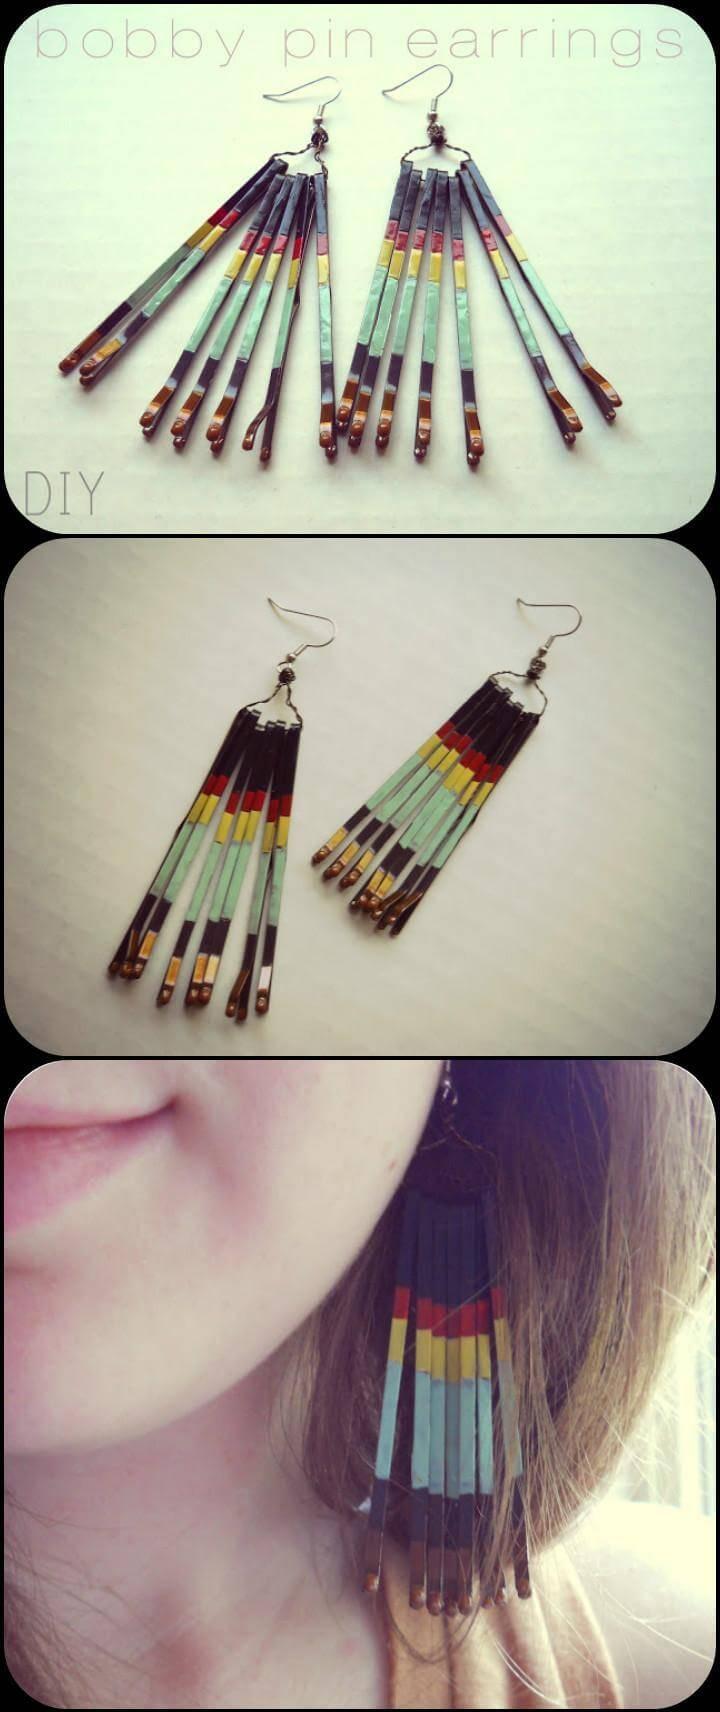 self-made bobby pin earrings